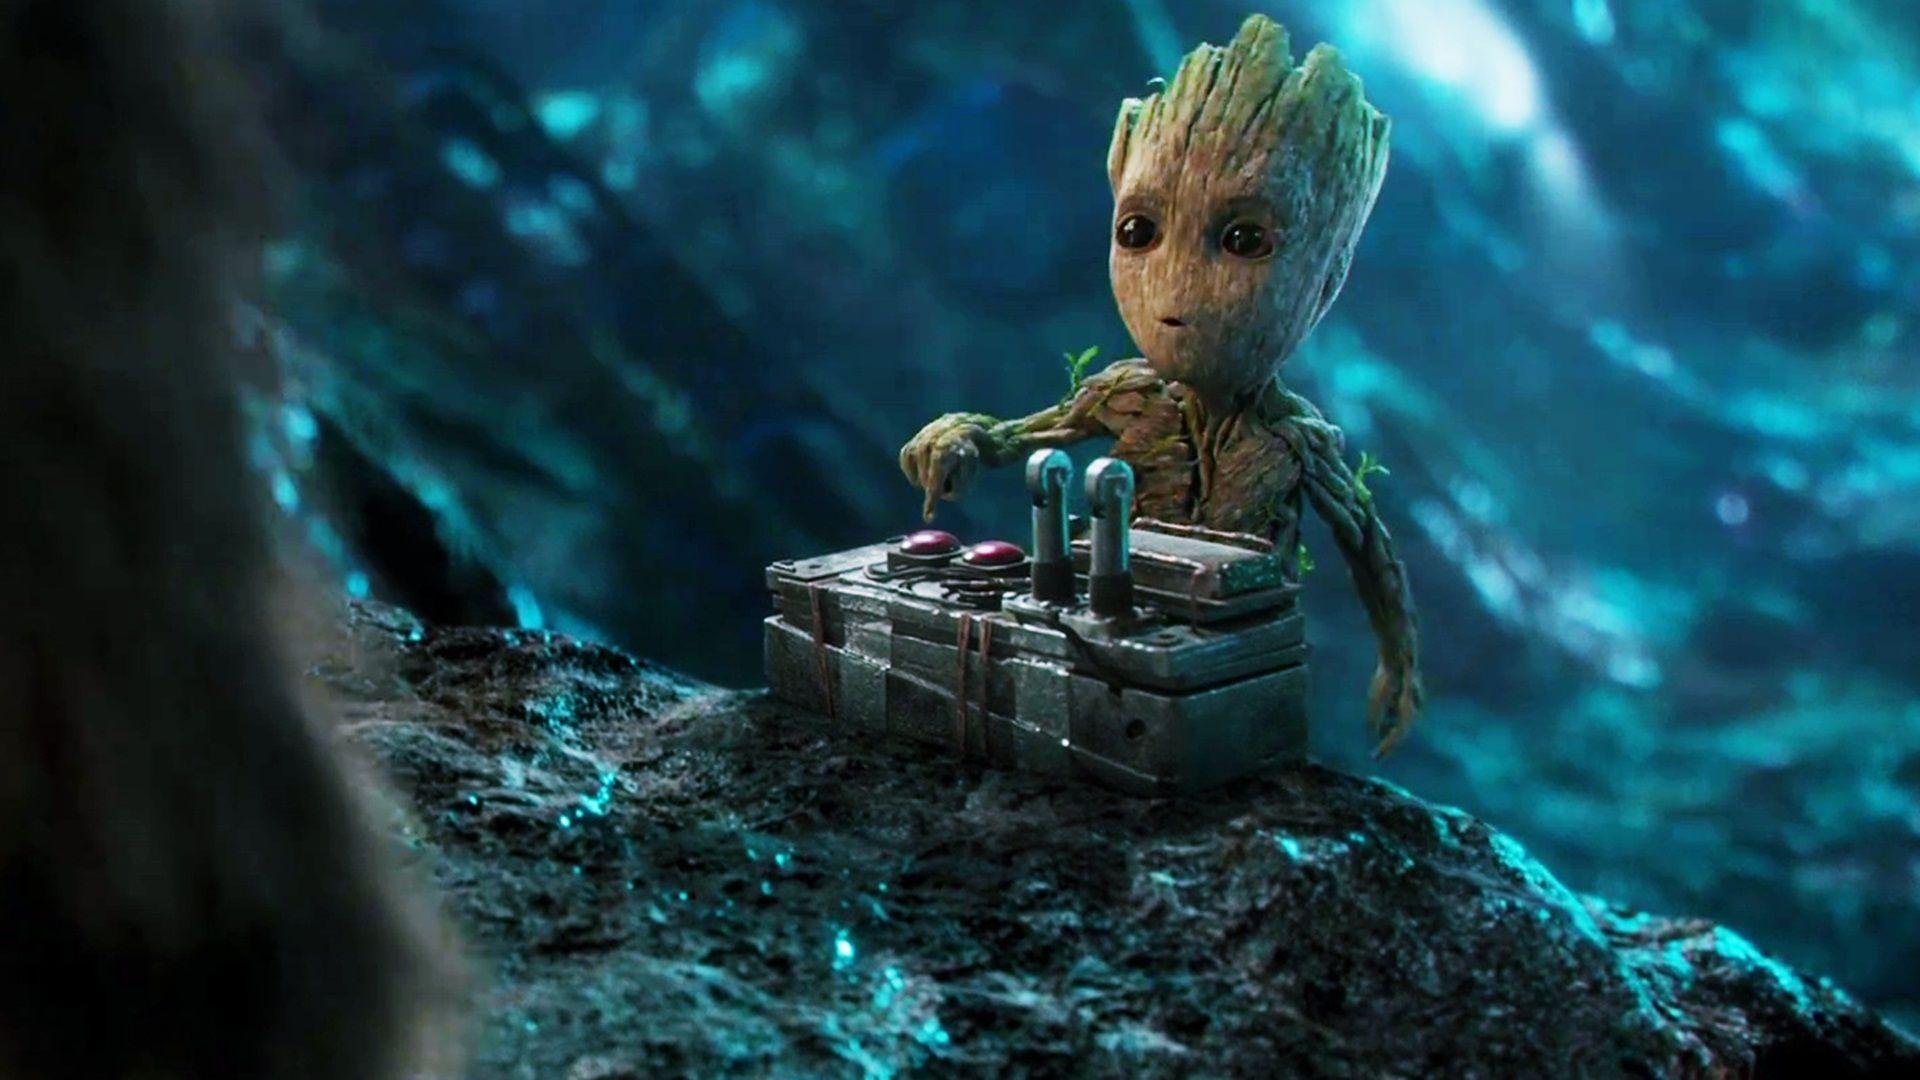 Groot Papeis De Parede Hd Planos De Fundo Wallpaper Guardians Of The Galaxy Guardians Of The Galaxy Vol 2 Baby Groot